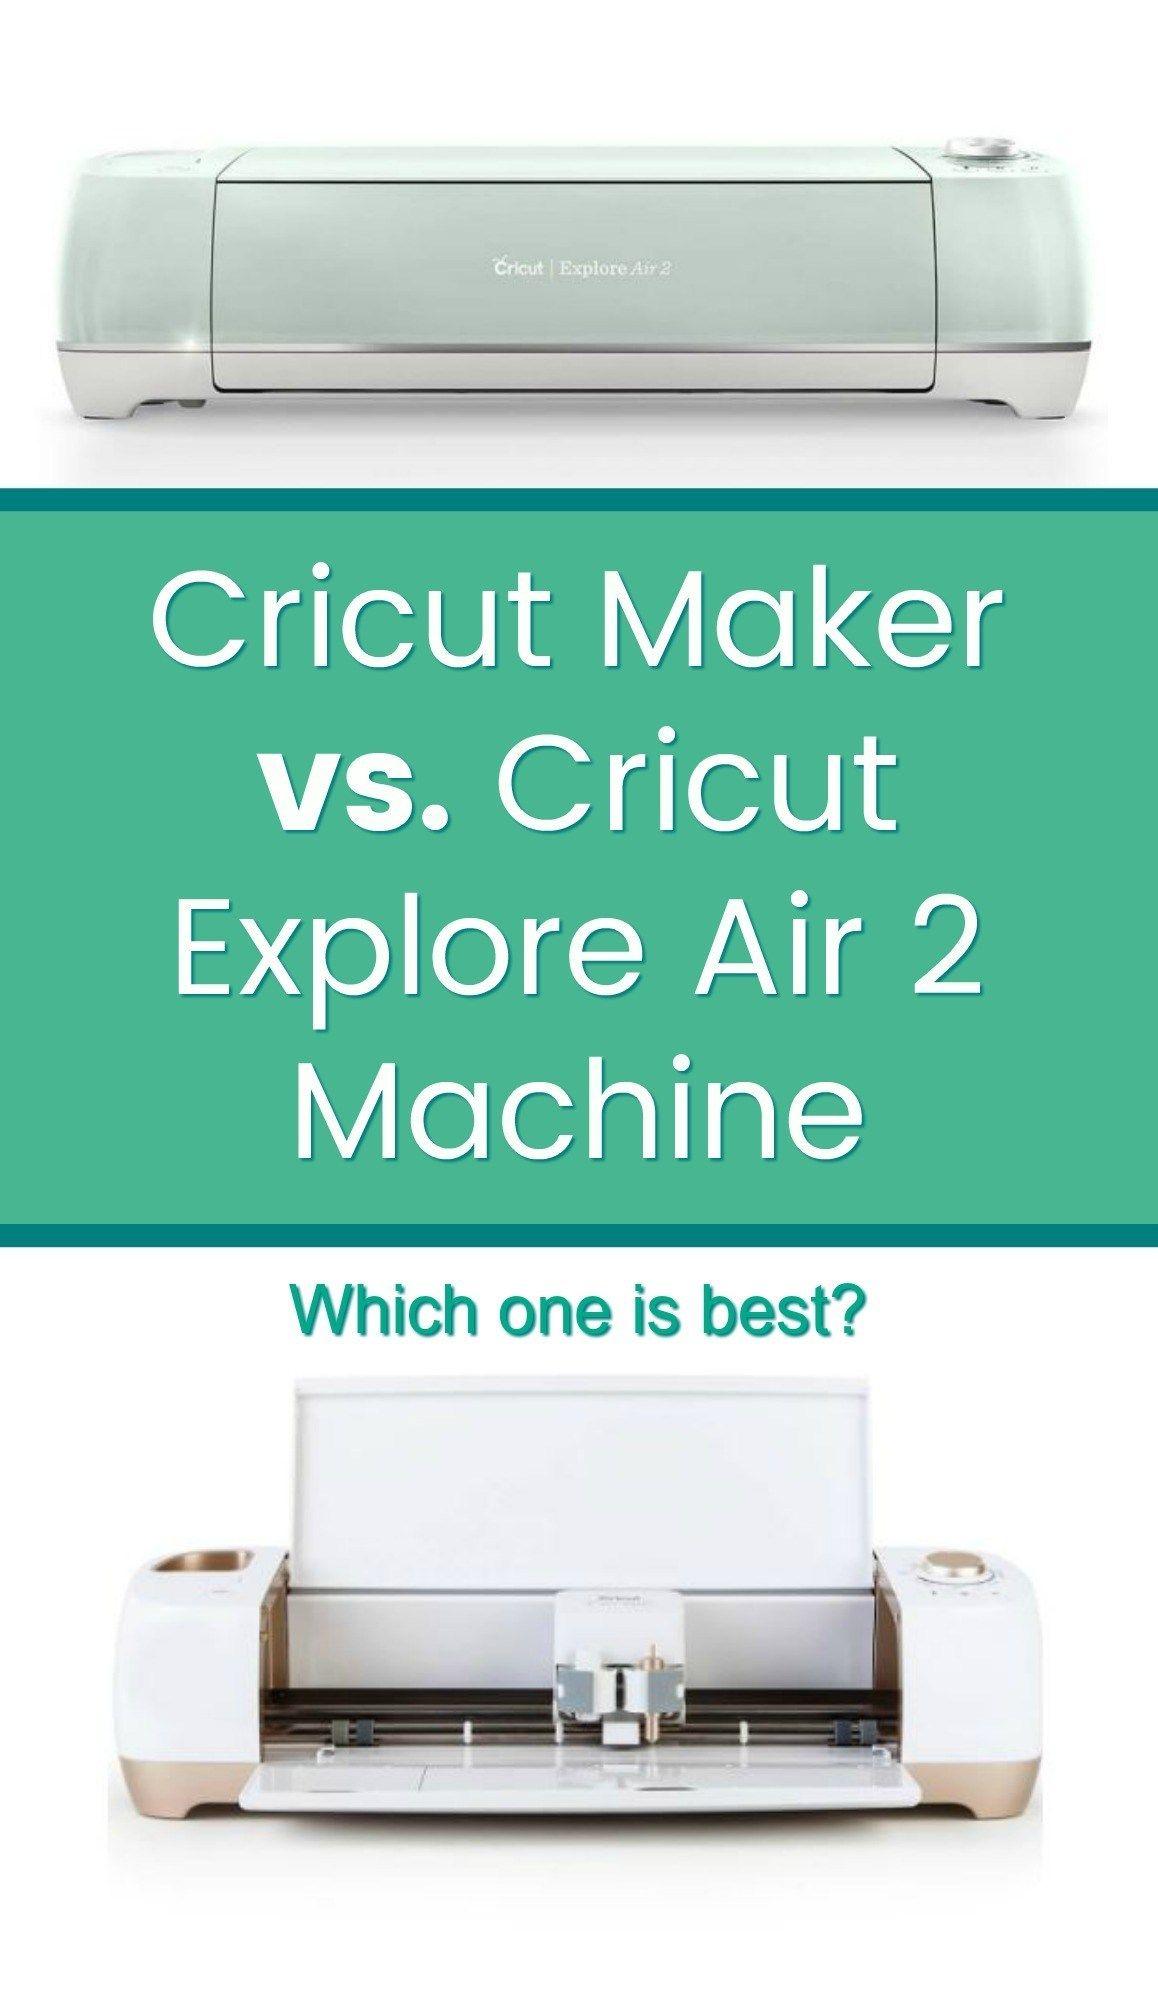 Cricut Maker vs Cricut Explore Air 2 Which Cricut